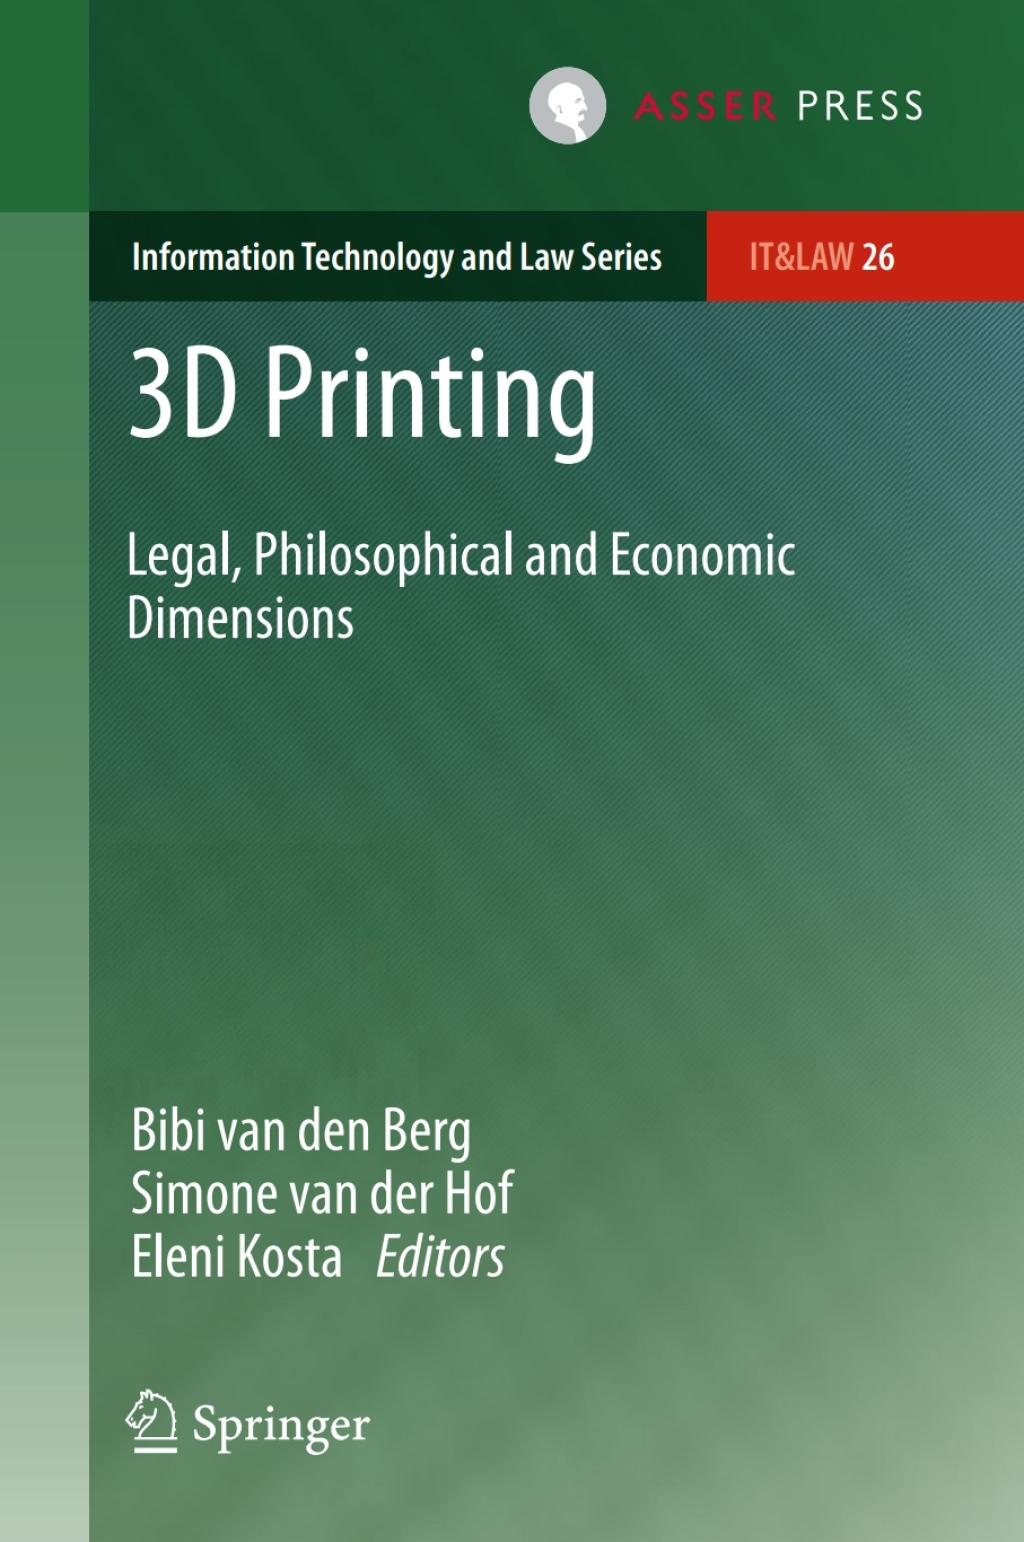 3D Printing (eBook) (9789462650961) photo